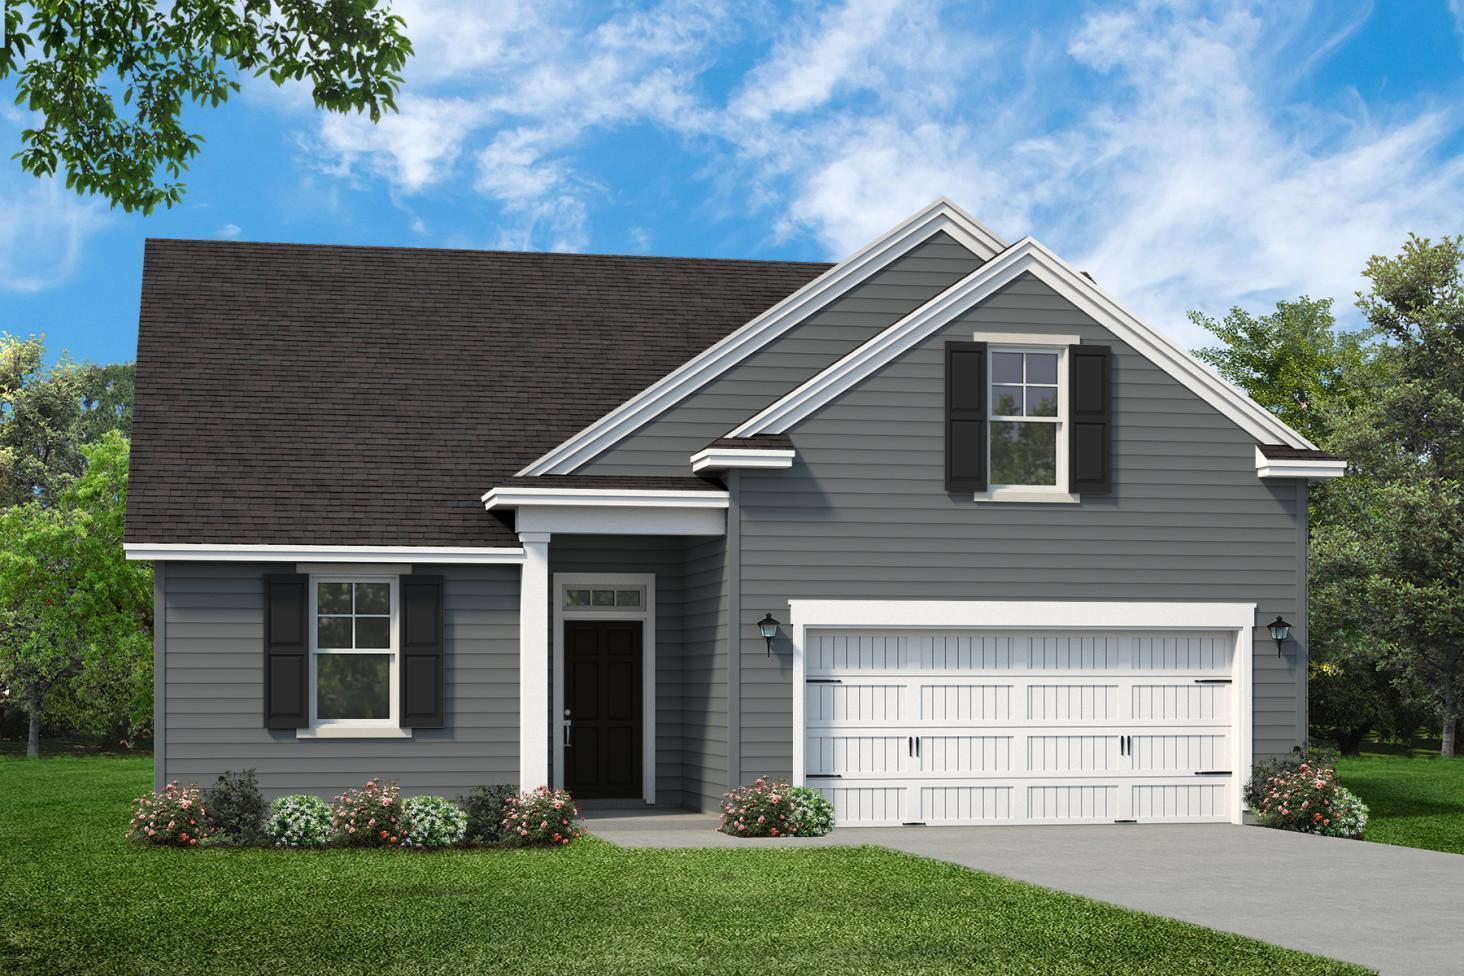 Chapel Creek Plantation Homes For Sale - 127 Birdie, Santee, SC - 0